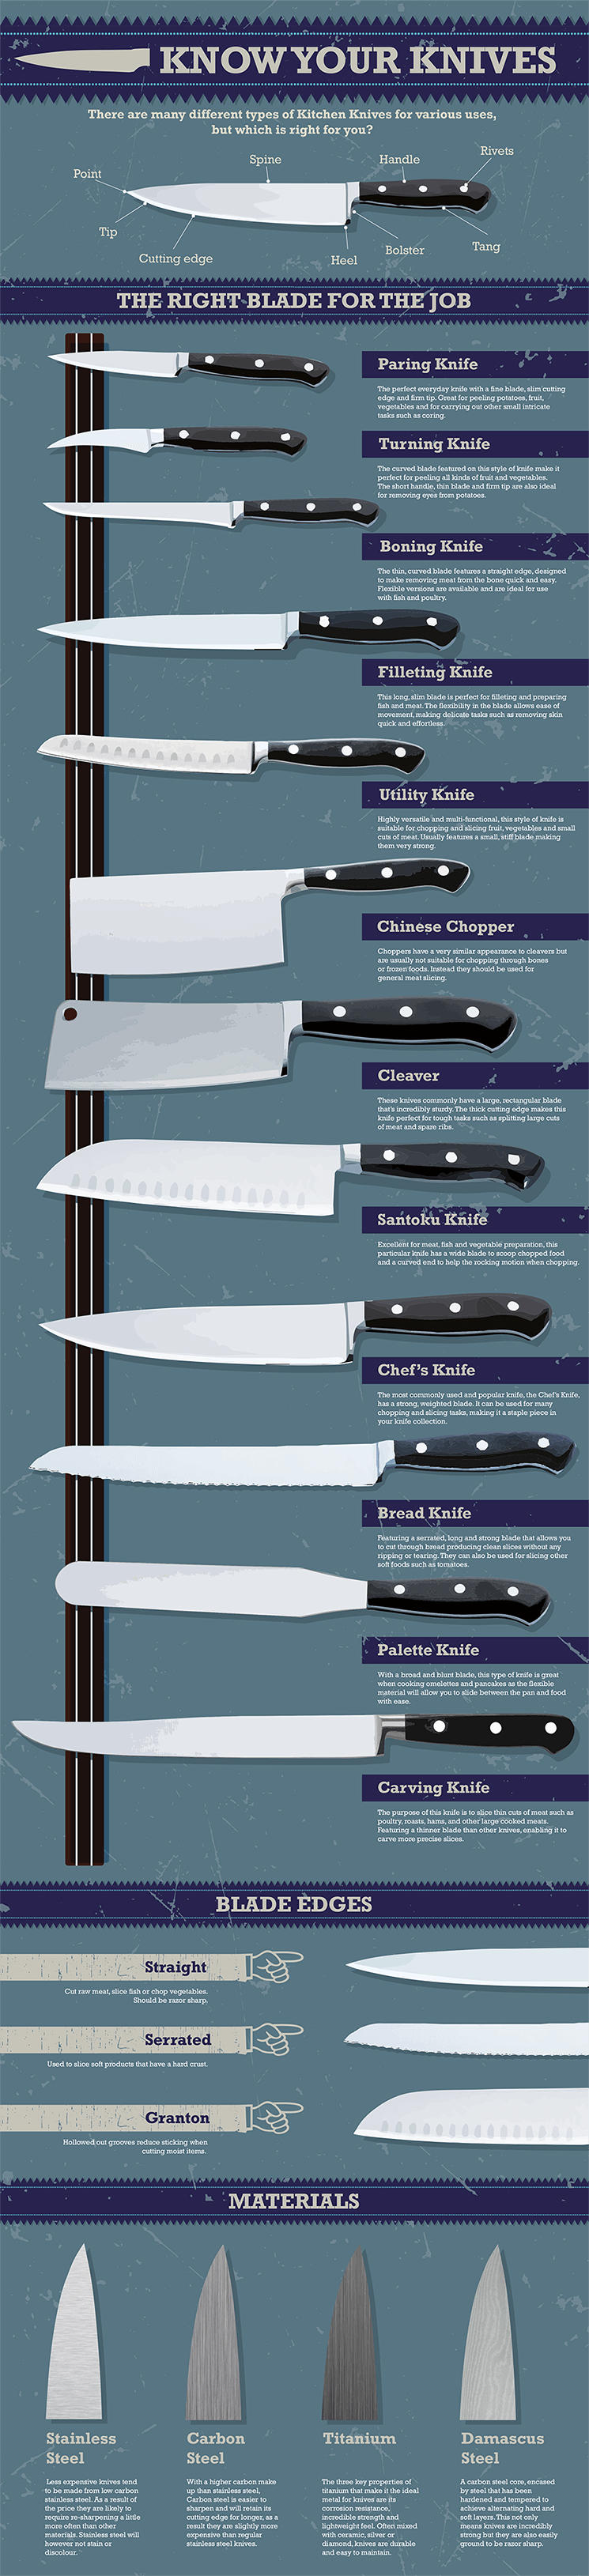 Best Kitchen Knife Set 2021 Top 13 Tested Ranked